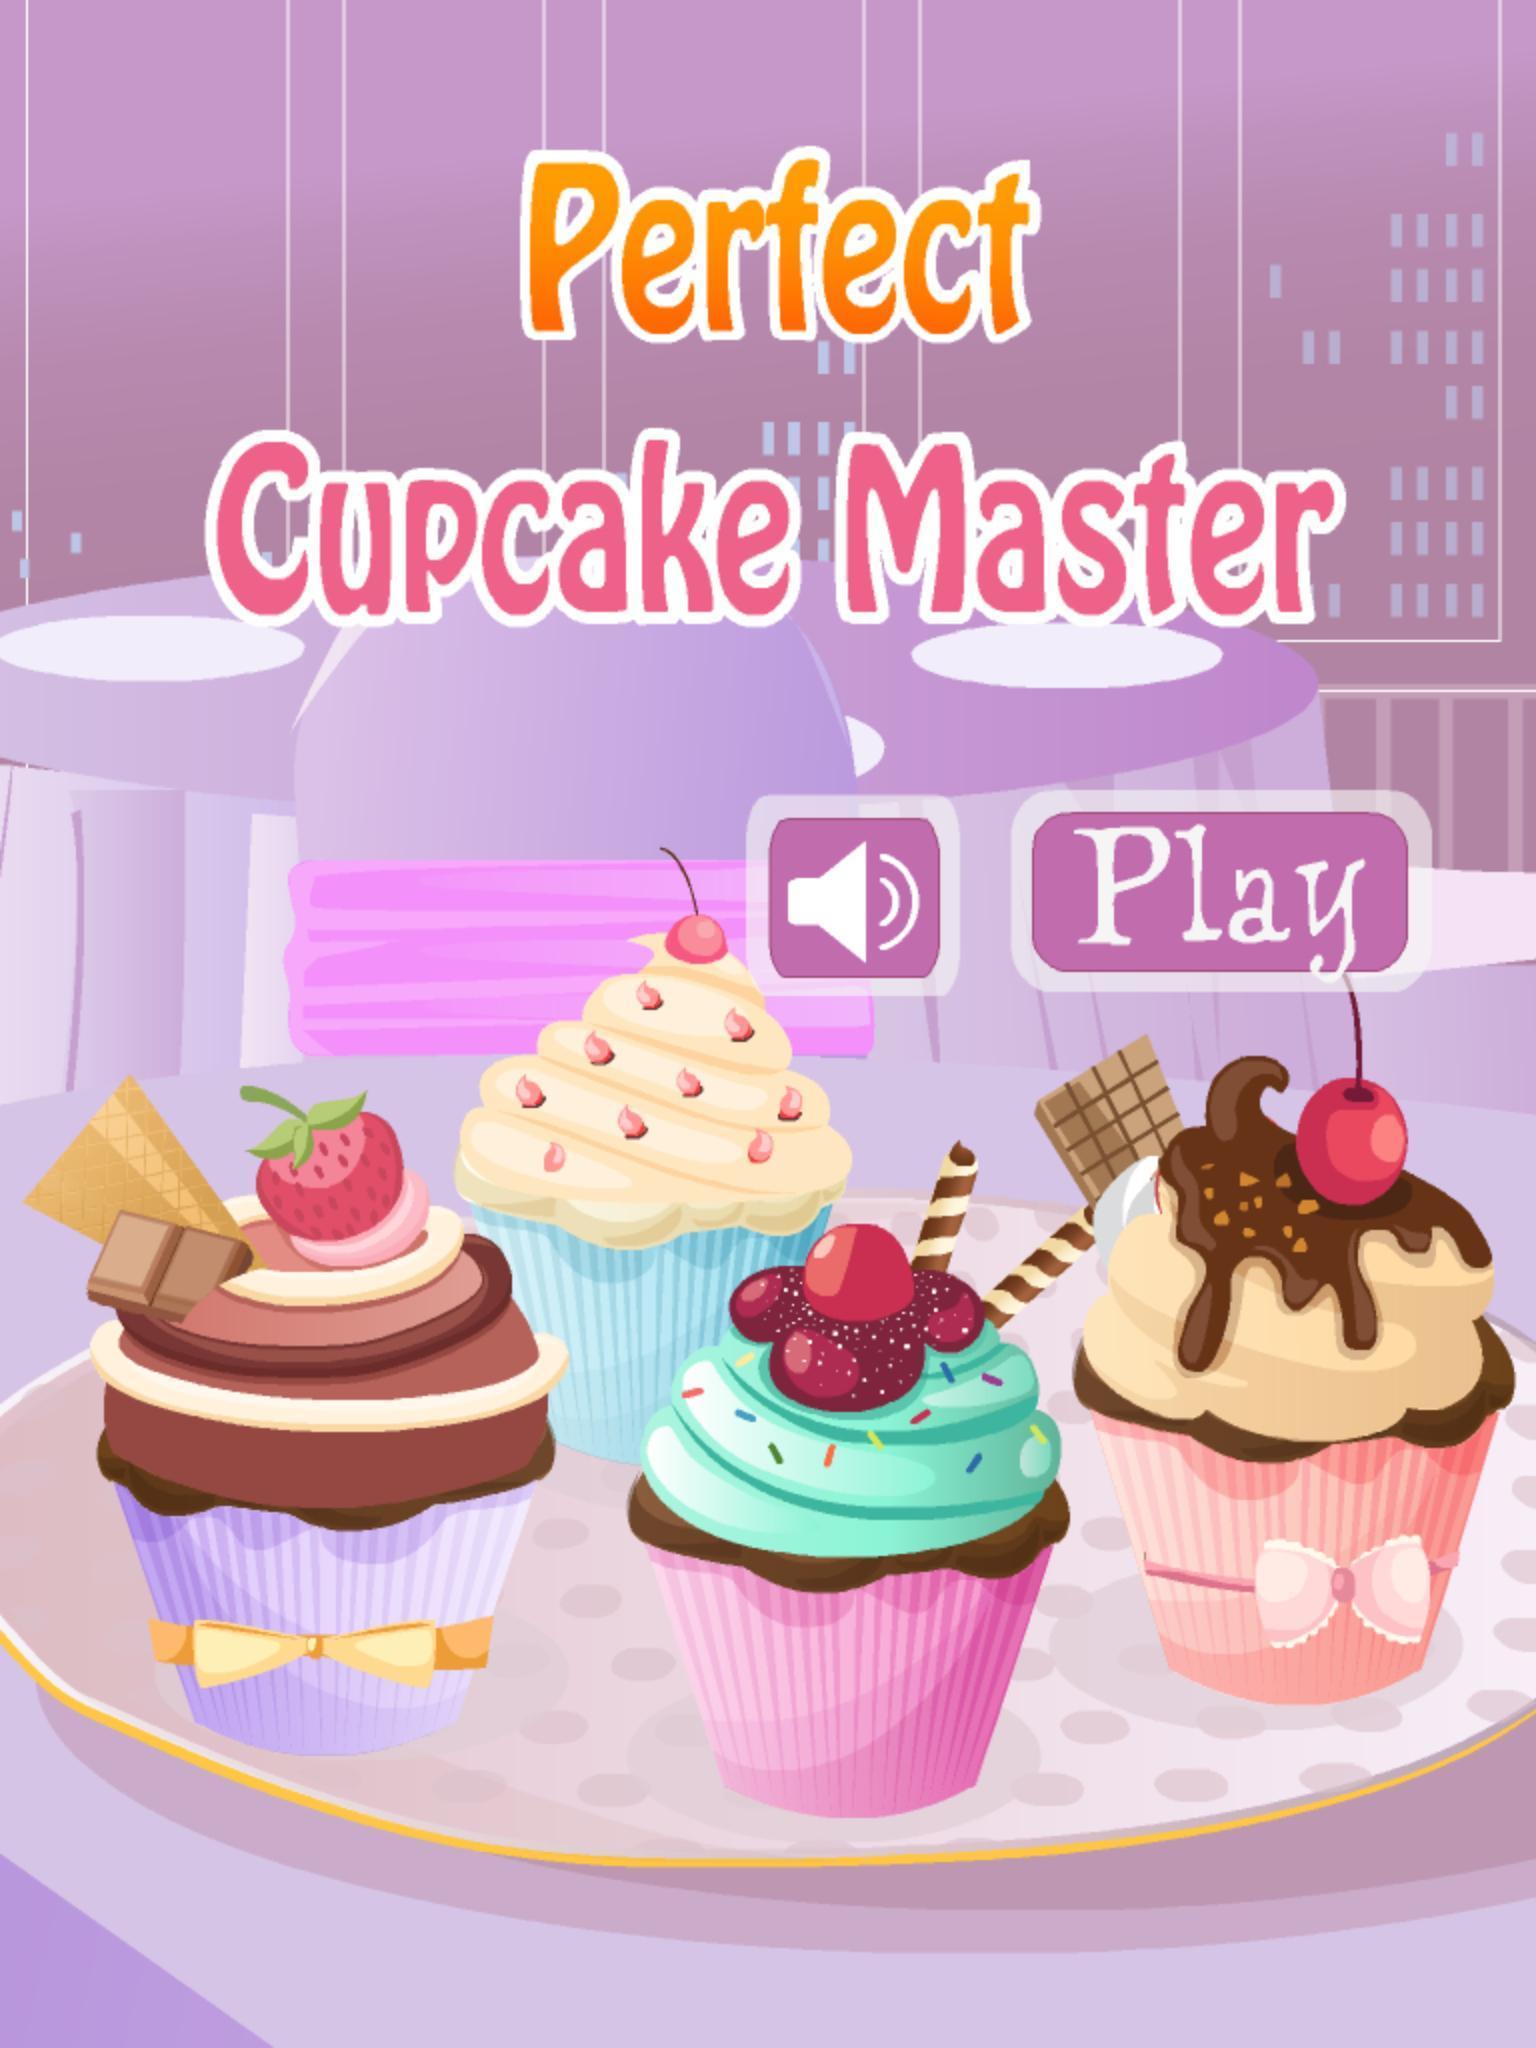 Perfect Cupcake Master 1.0.2 Screenshot 4